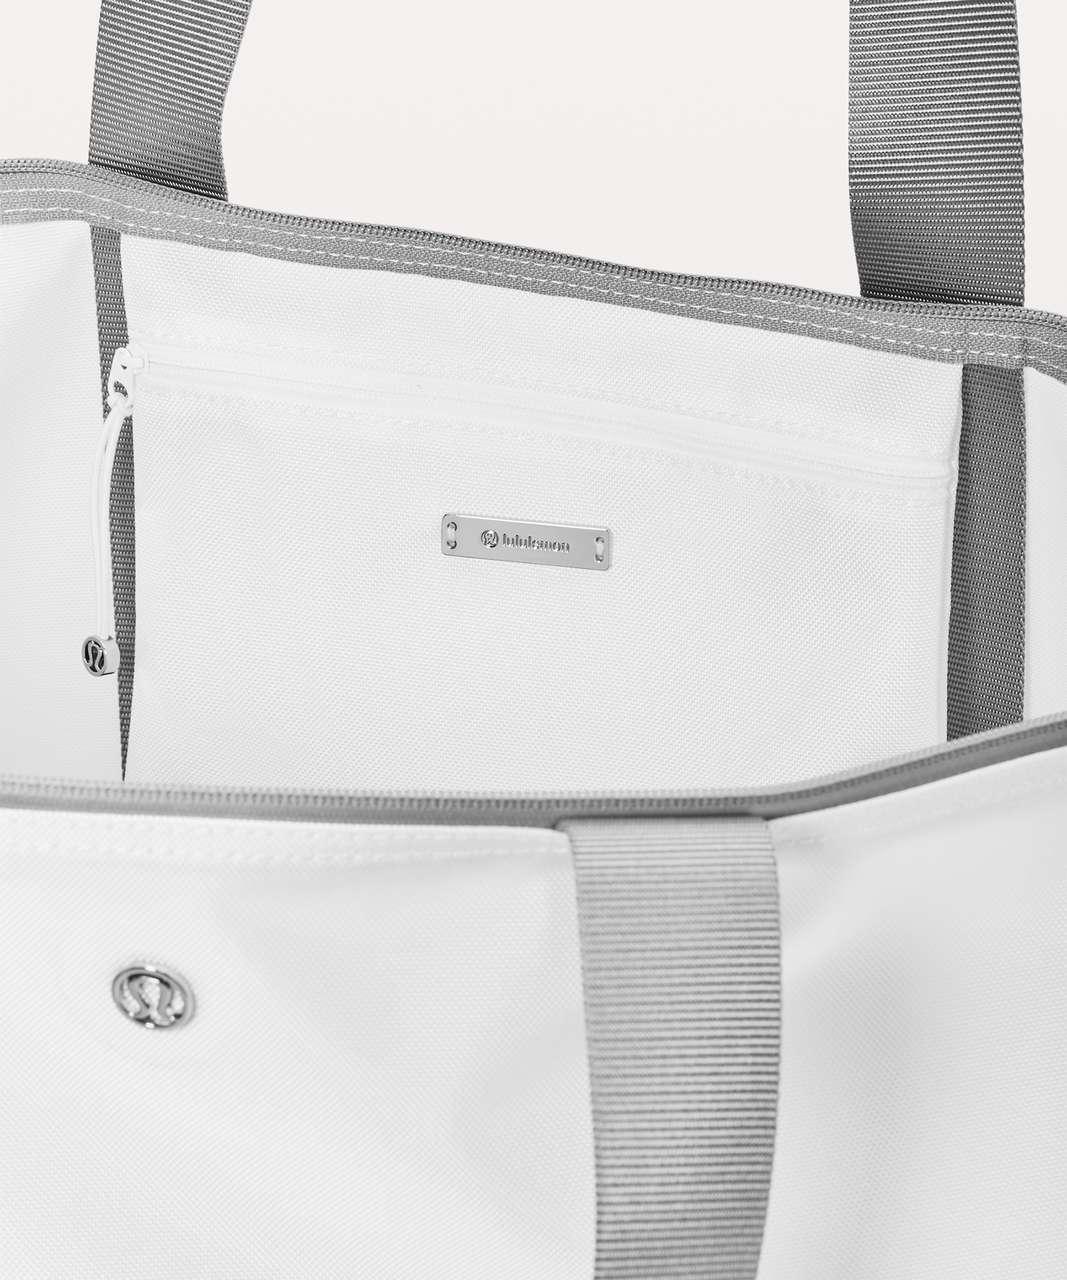 Lululemon The Fundamental Tote *Large 36L - White / Raceway Grey